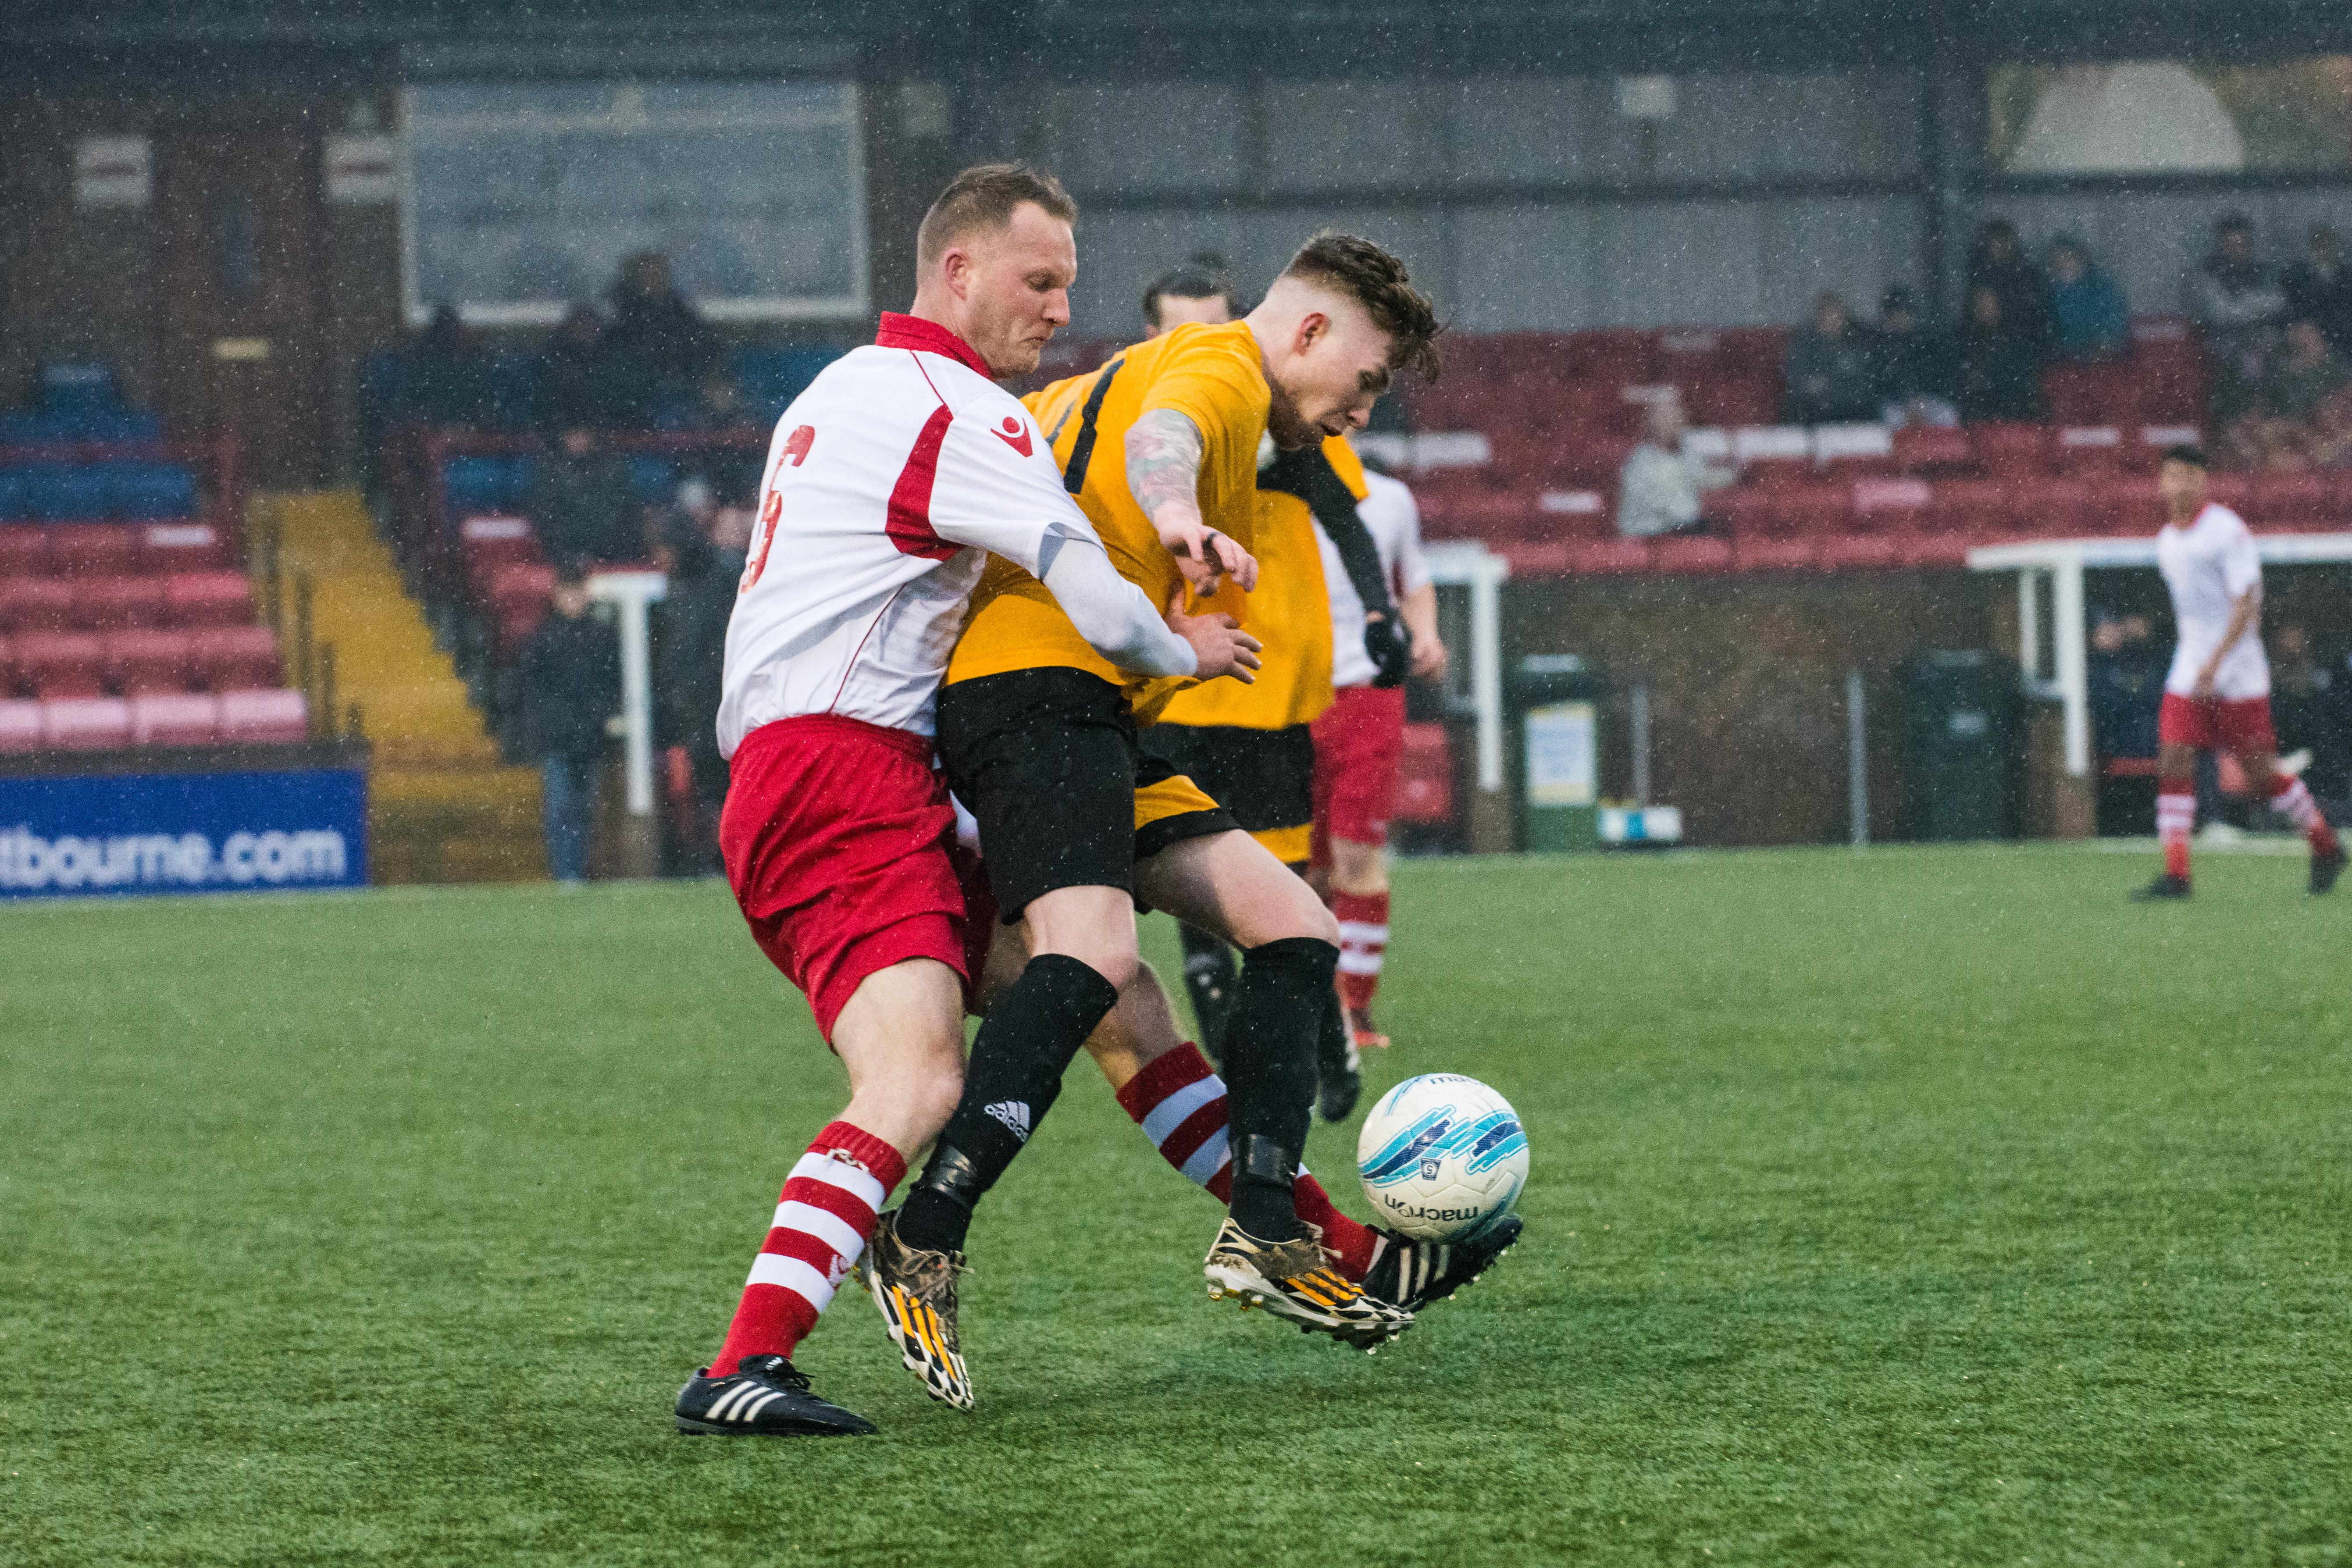 DAVID_JEFFERY Langney Wanderers FC vs Bexhill United FC 03.03.18 84